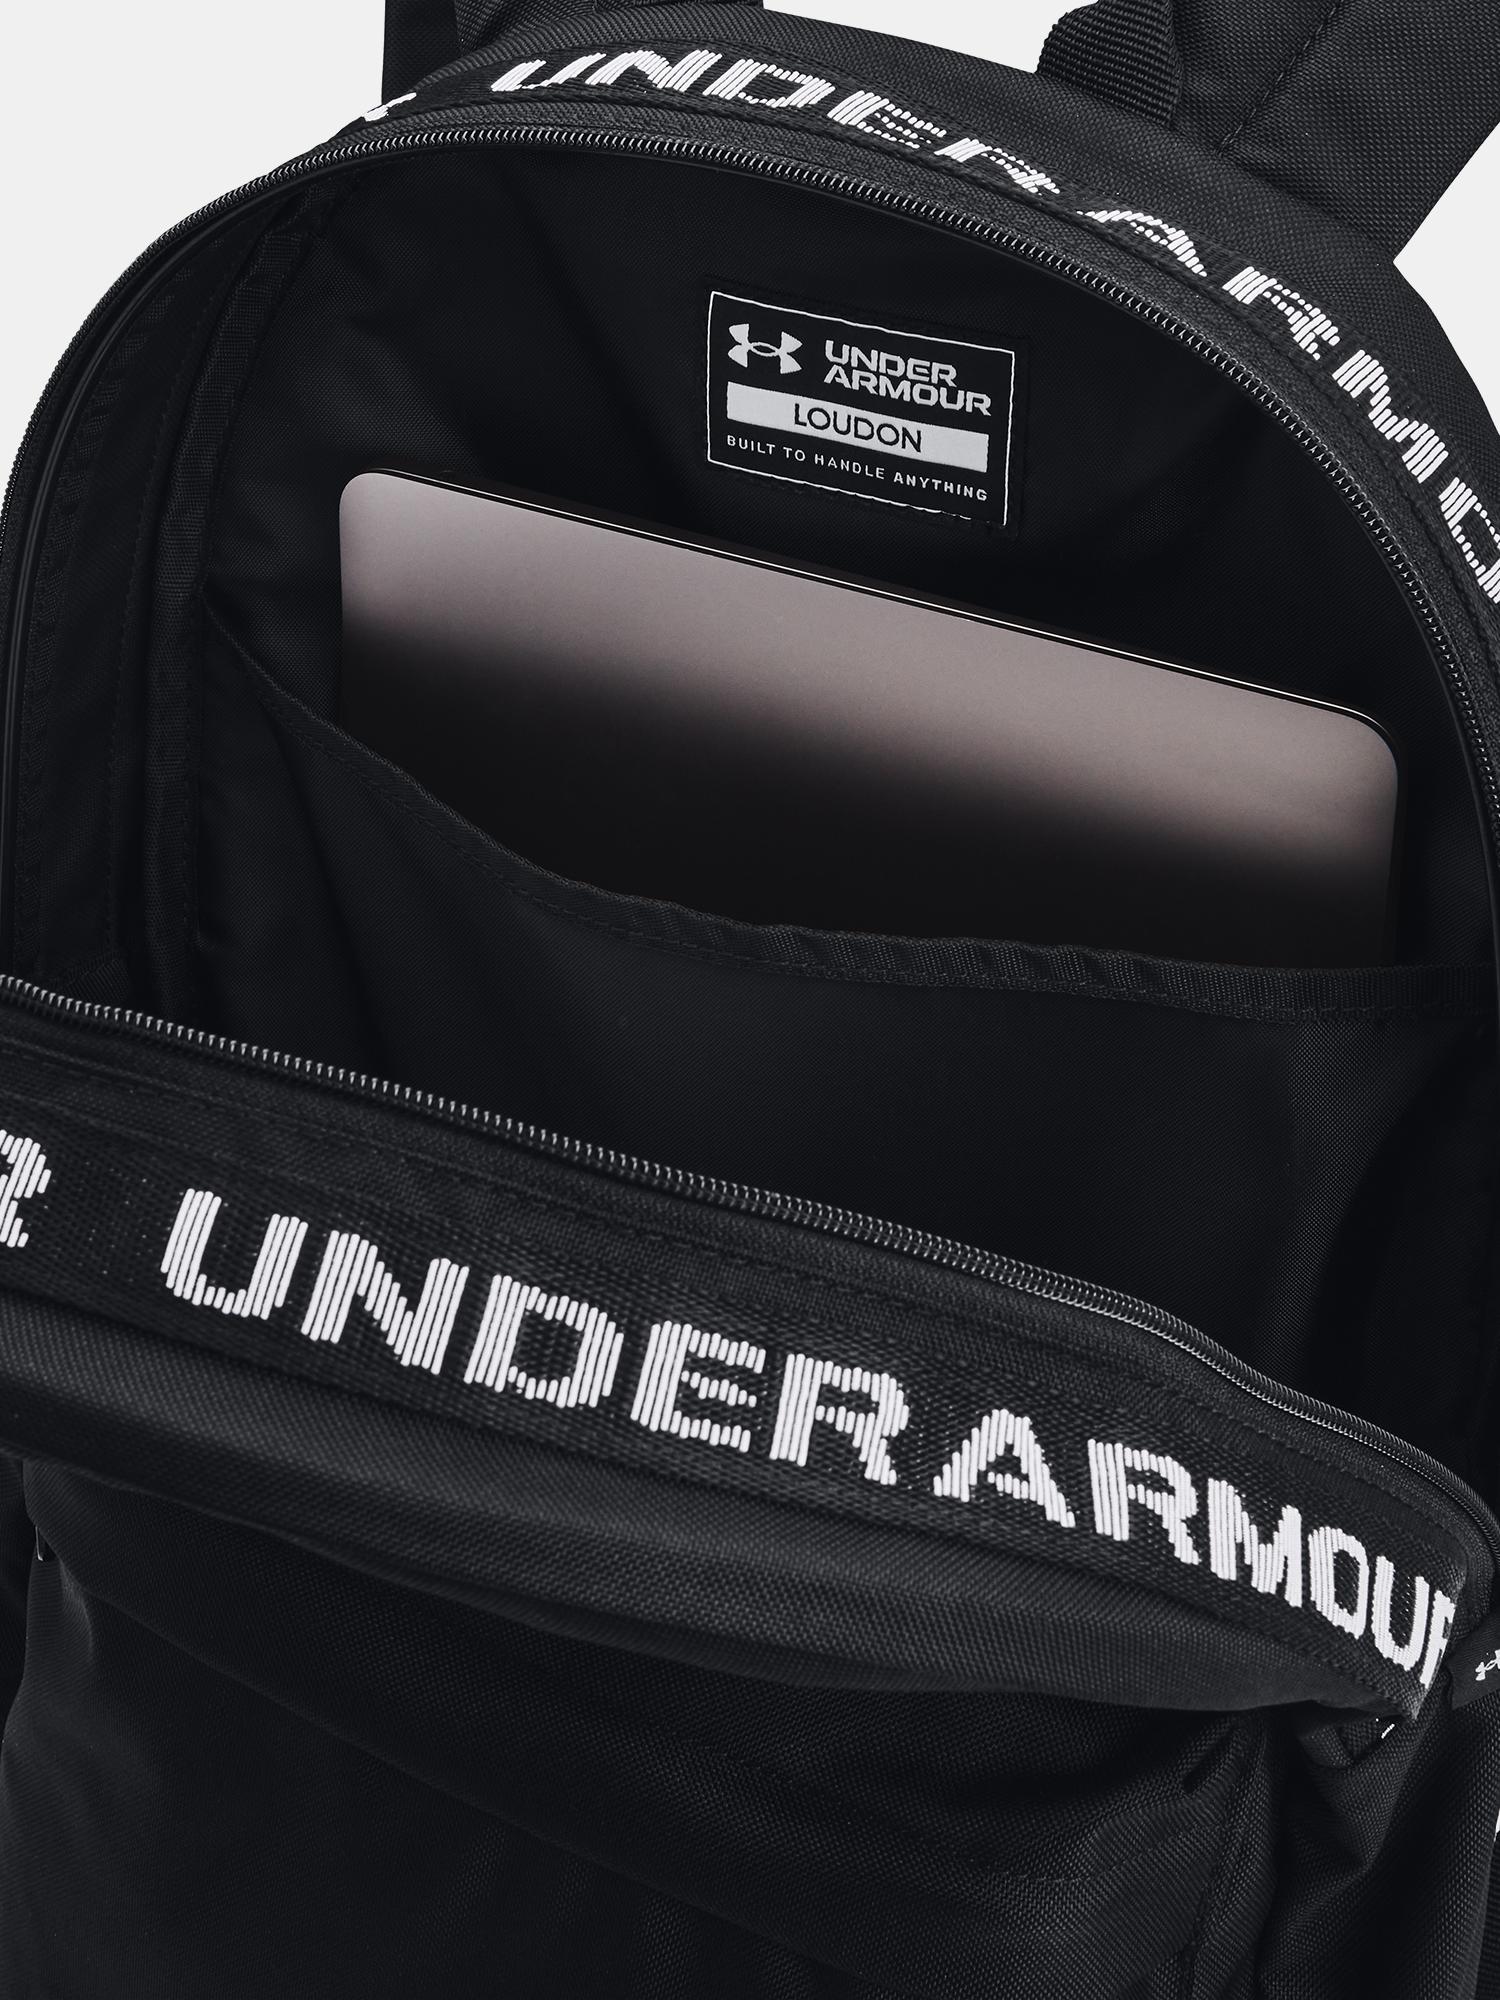 Under Armour Plecak damski czarny